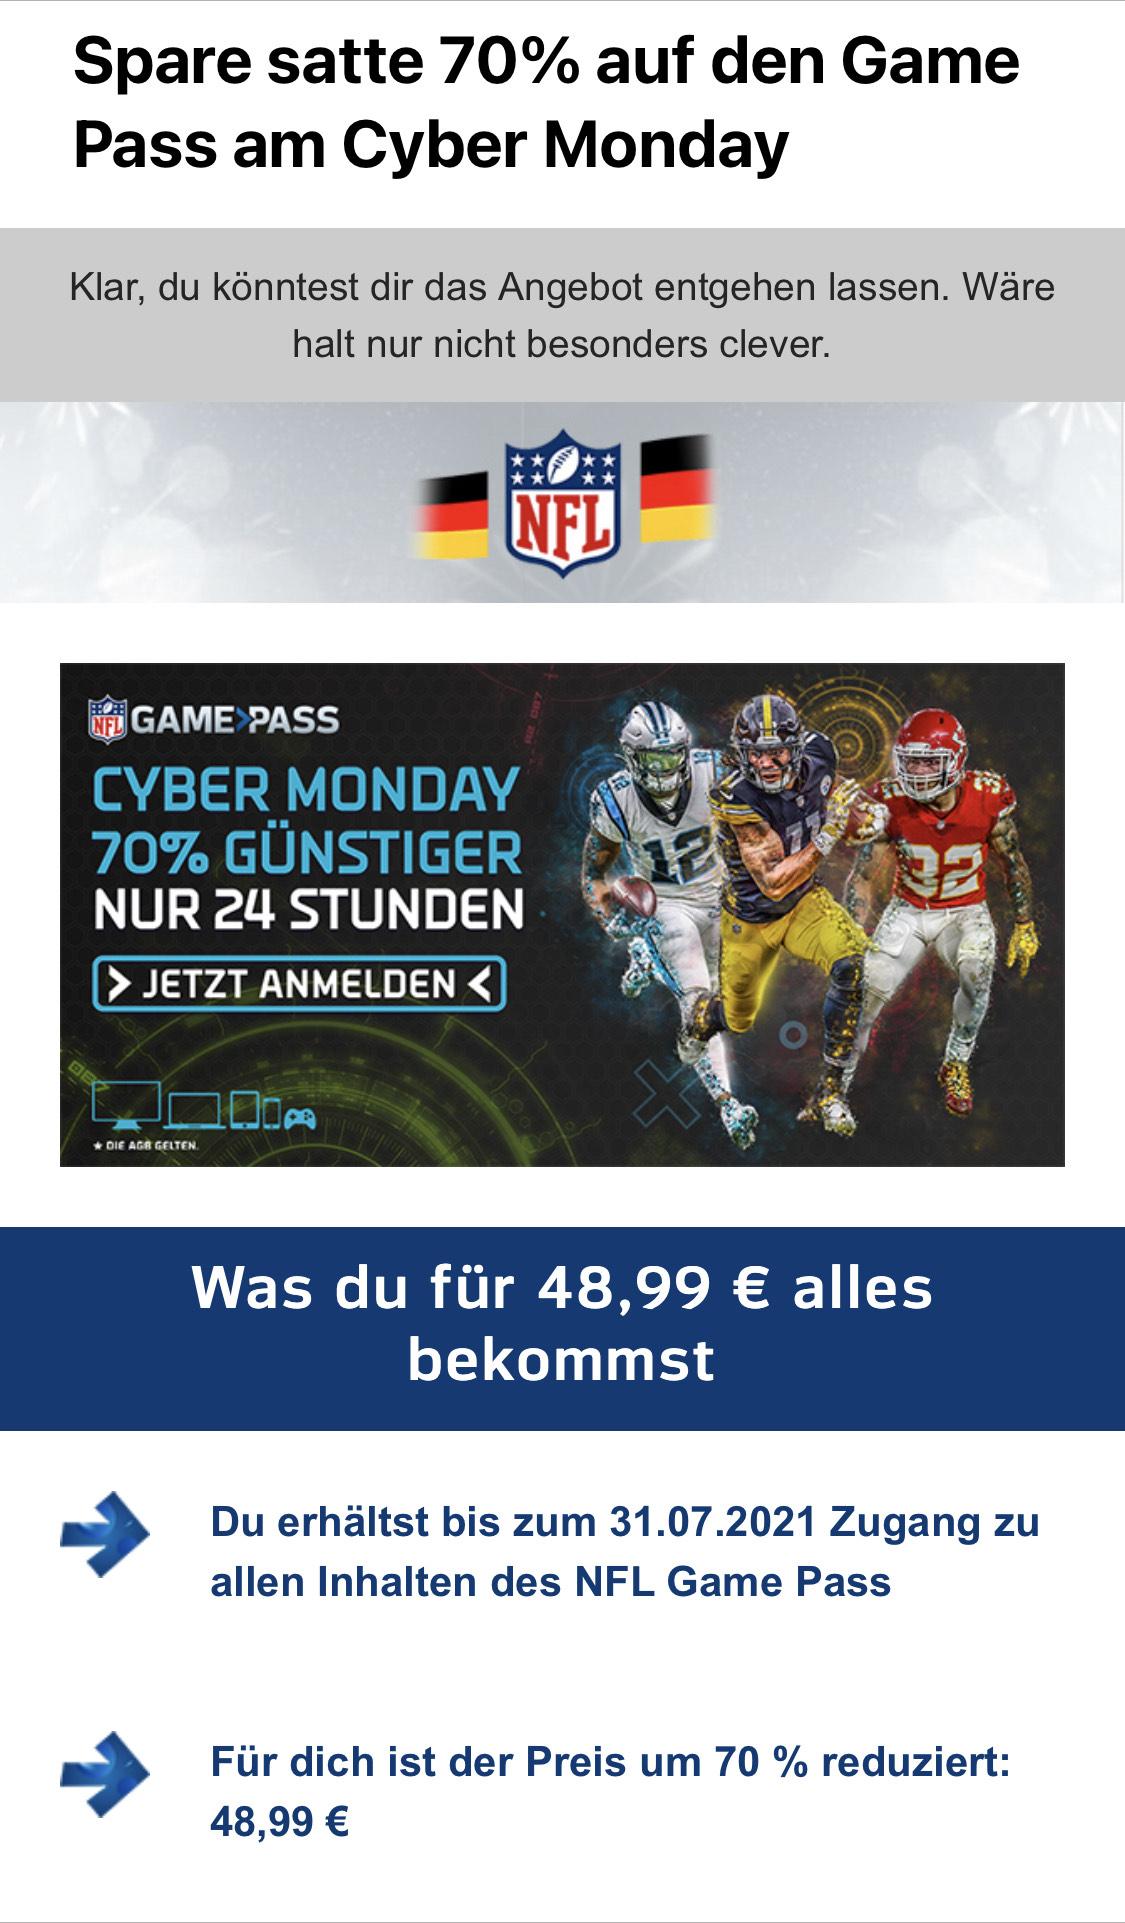 NFL Game Pass 70% reduziert